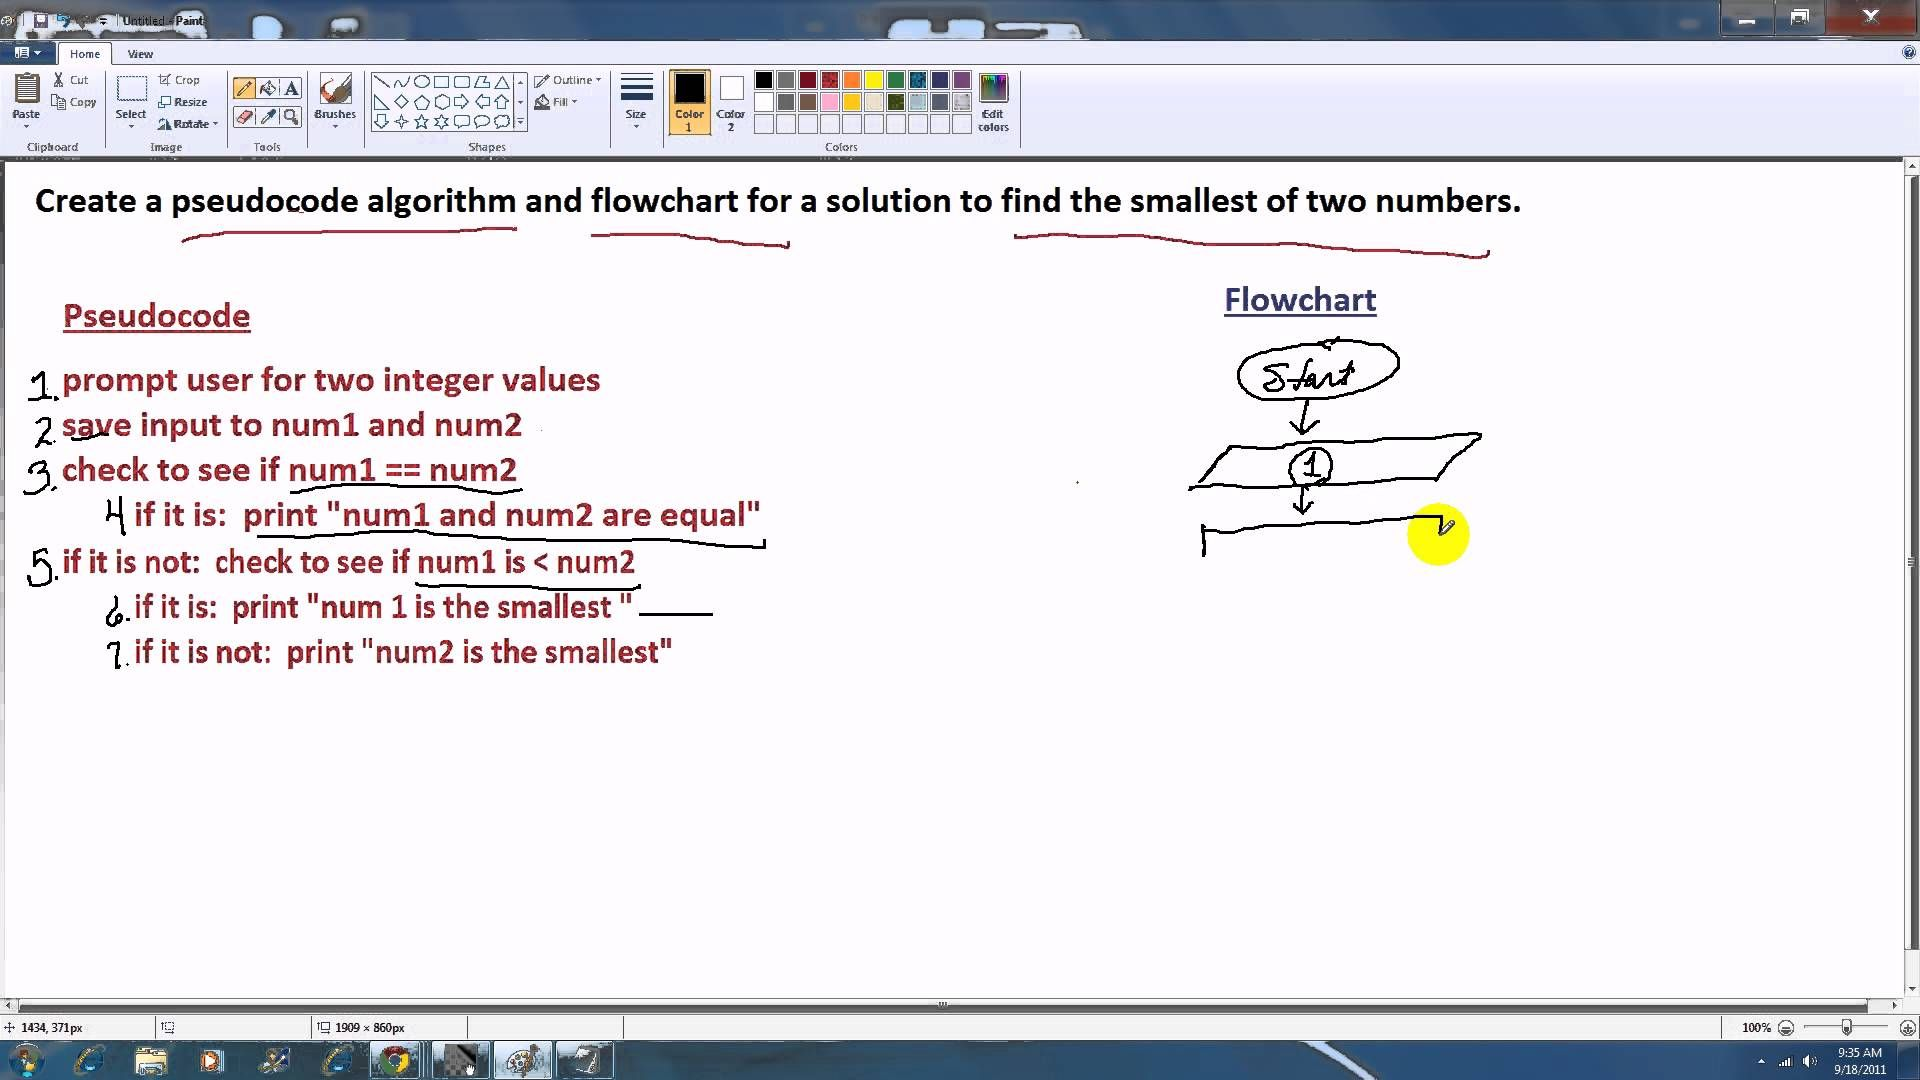 Pseudocode and Flowchart   Flow chart, Algorithm, Computer ...